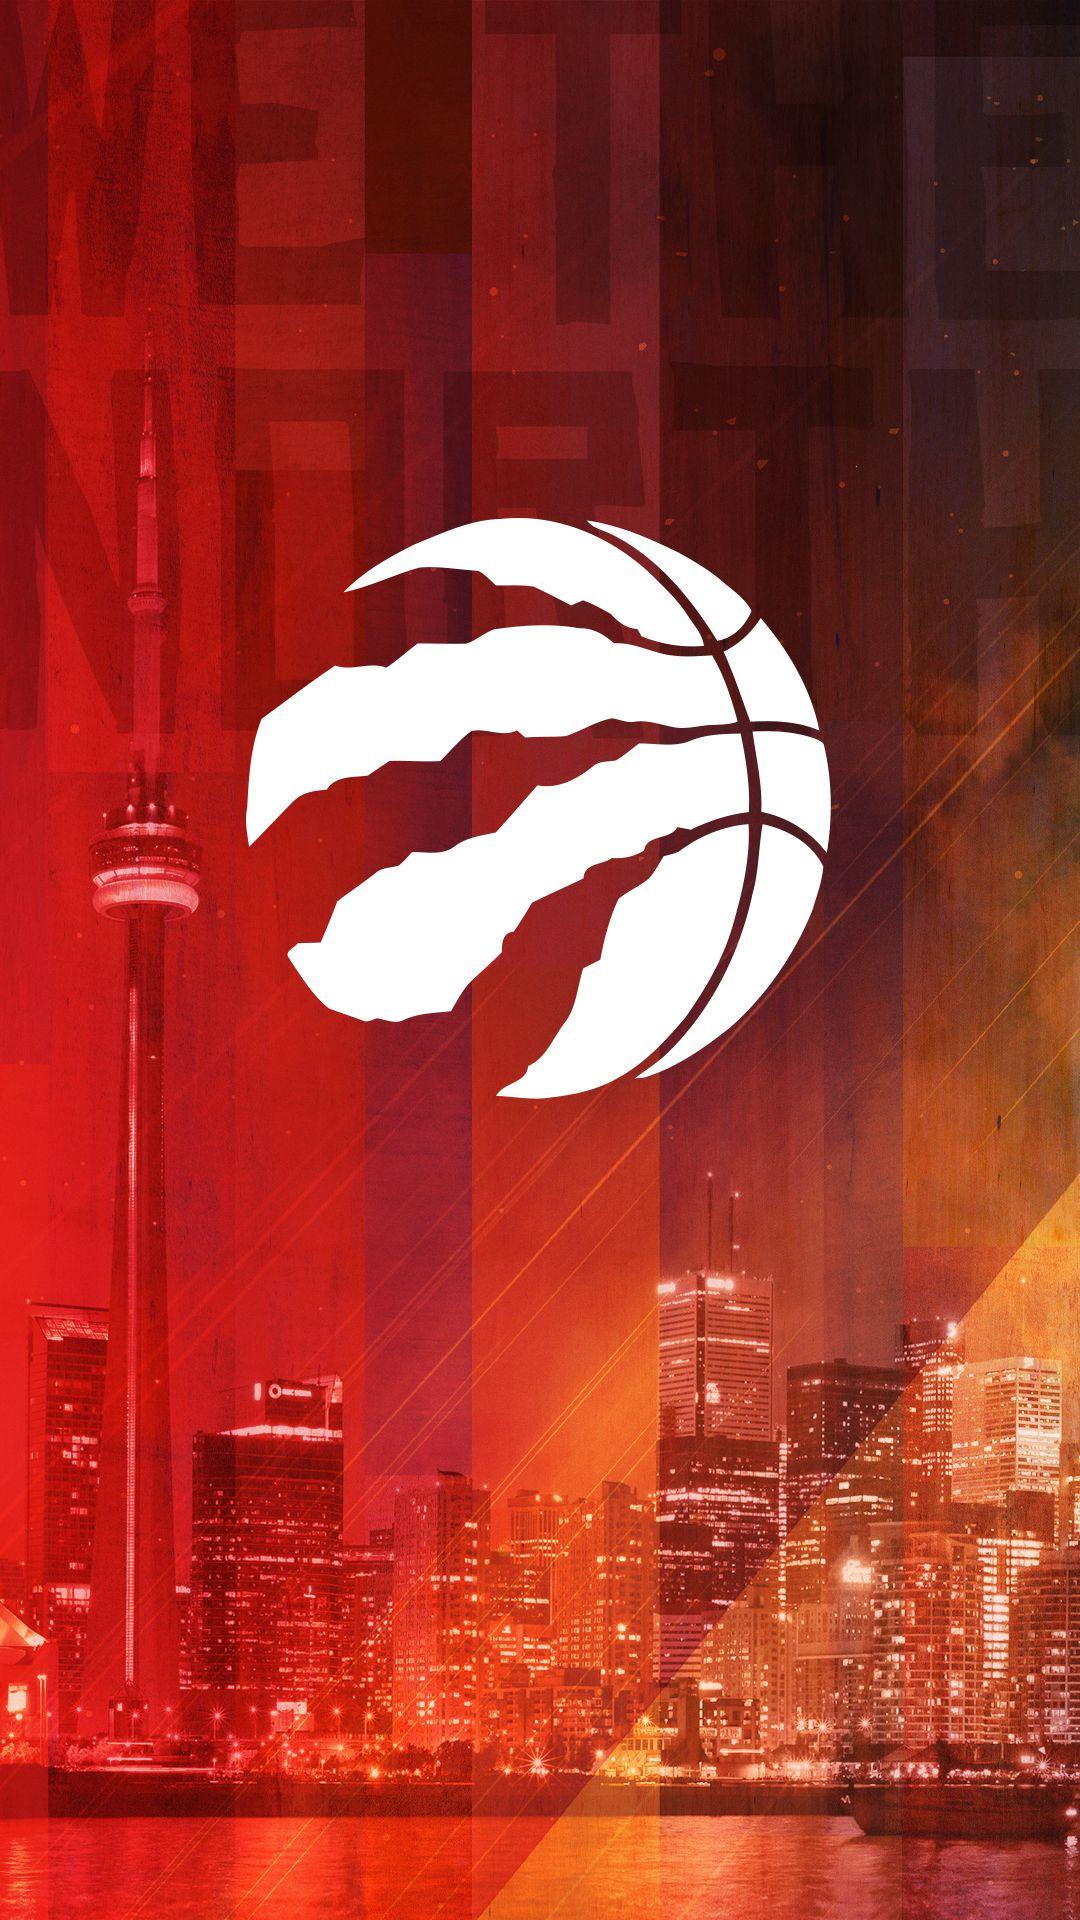 Toronto Raptors Wallpaper Mobile New Logo Imgur Toronto Raptors Basketball Raptors Wallpaper Raptors Basketball